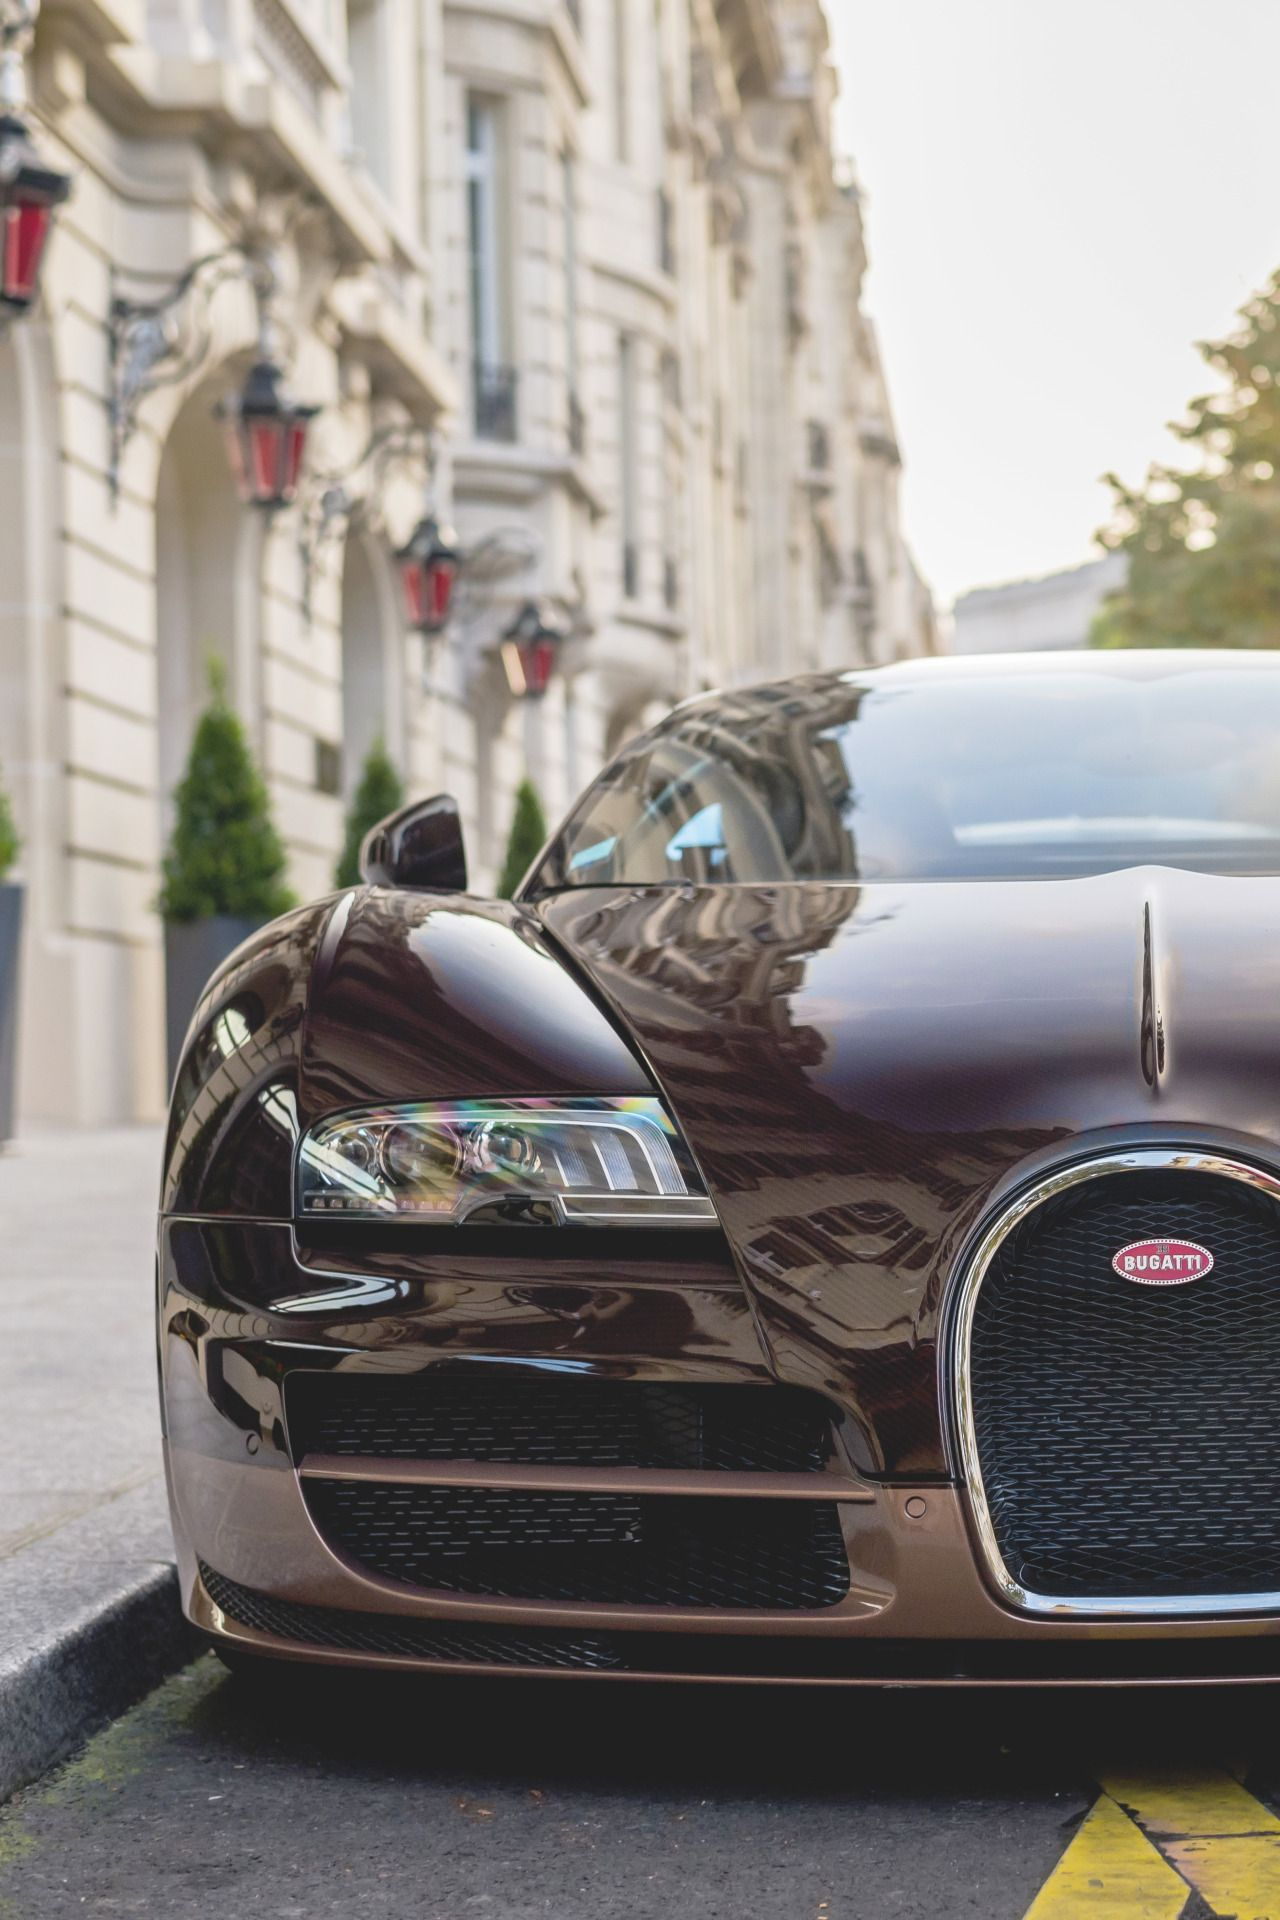 f61ecd2f205435a833415c07c3986042 Inspiring Bugatti Veyron Price Australian Dollars Cars Trend